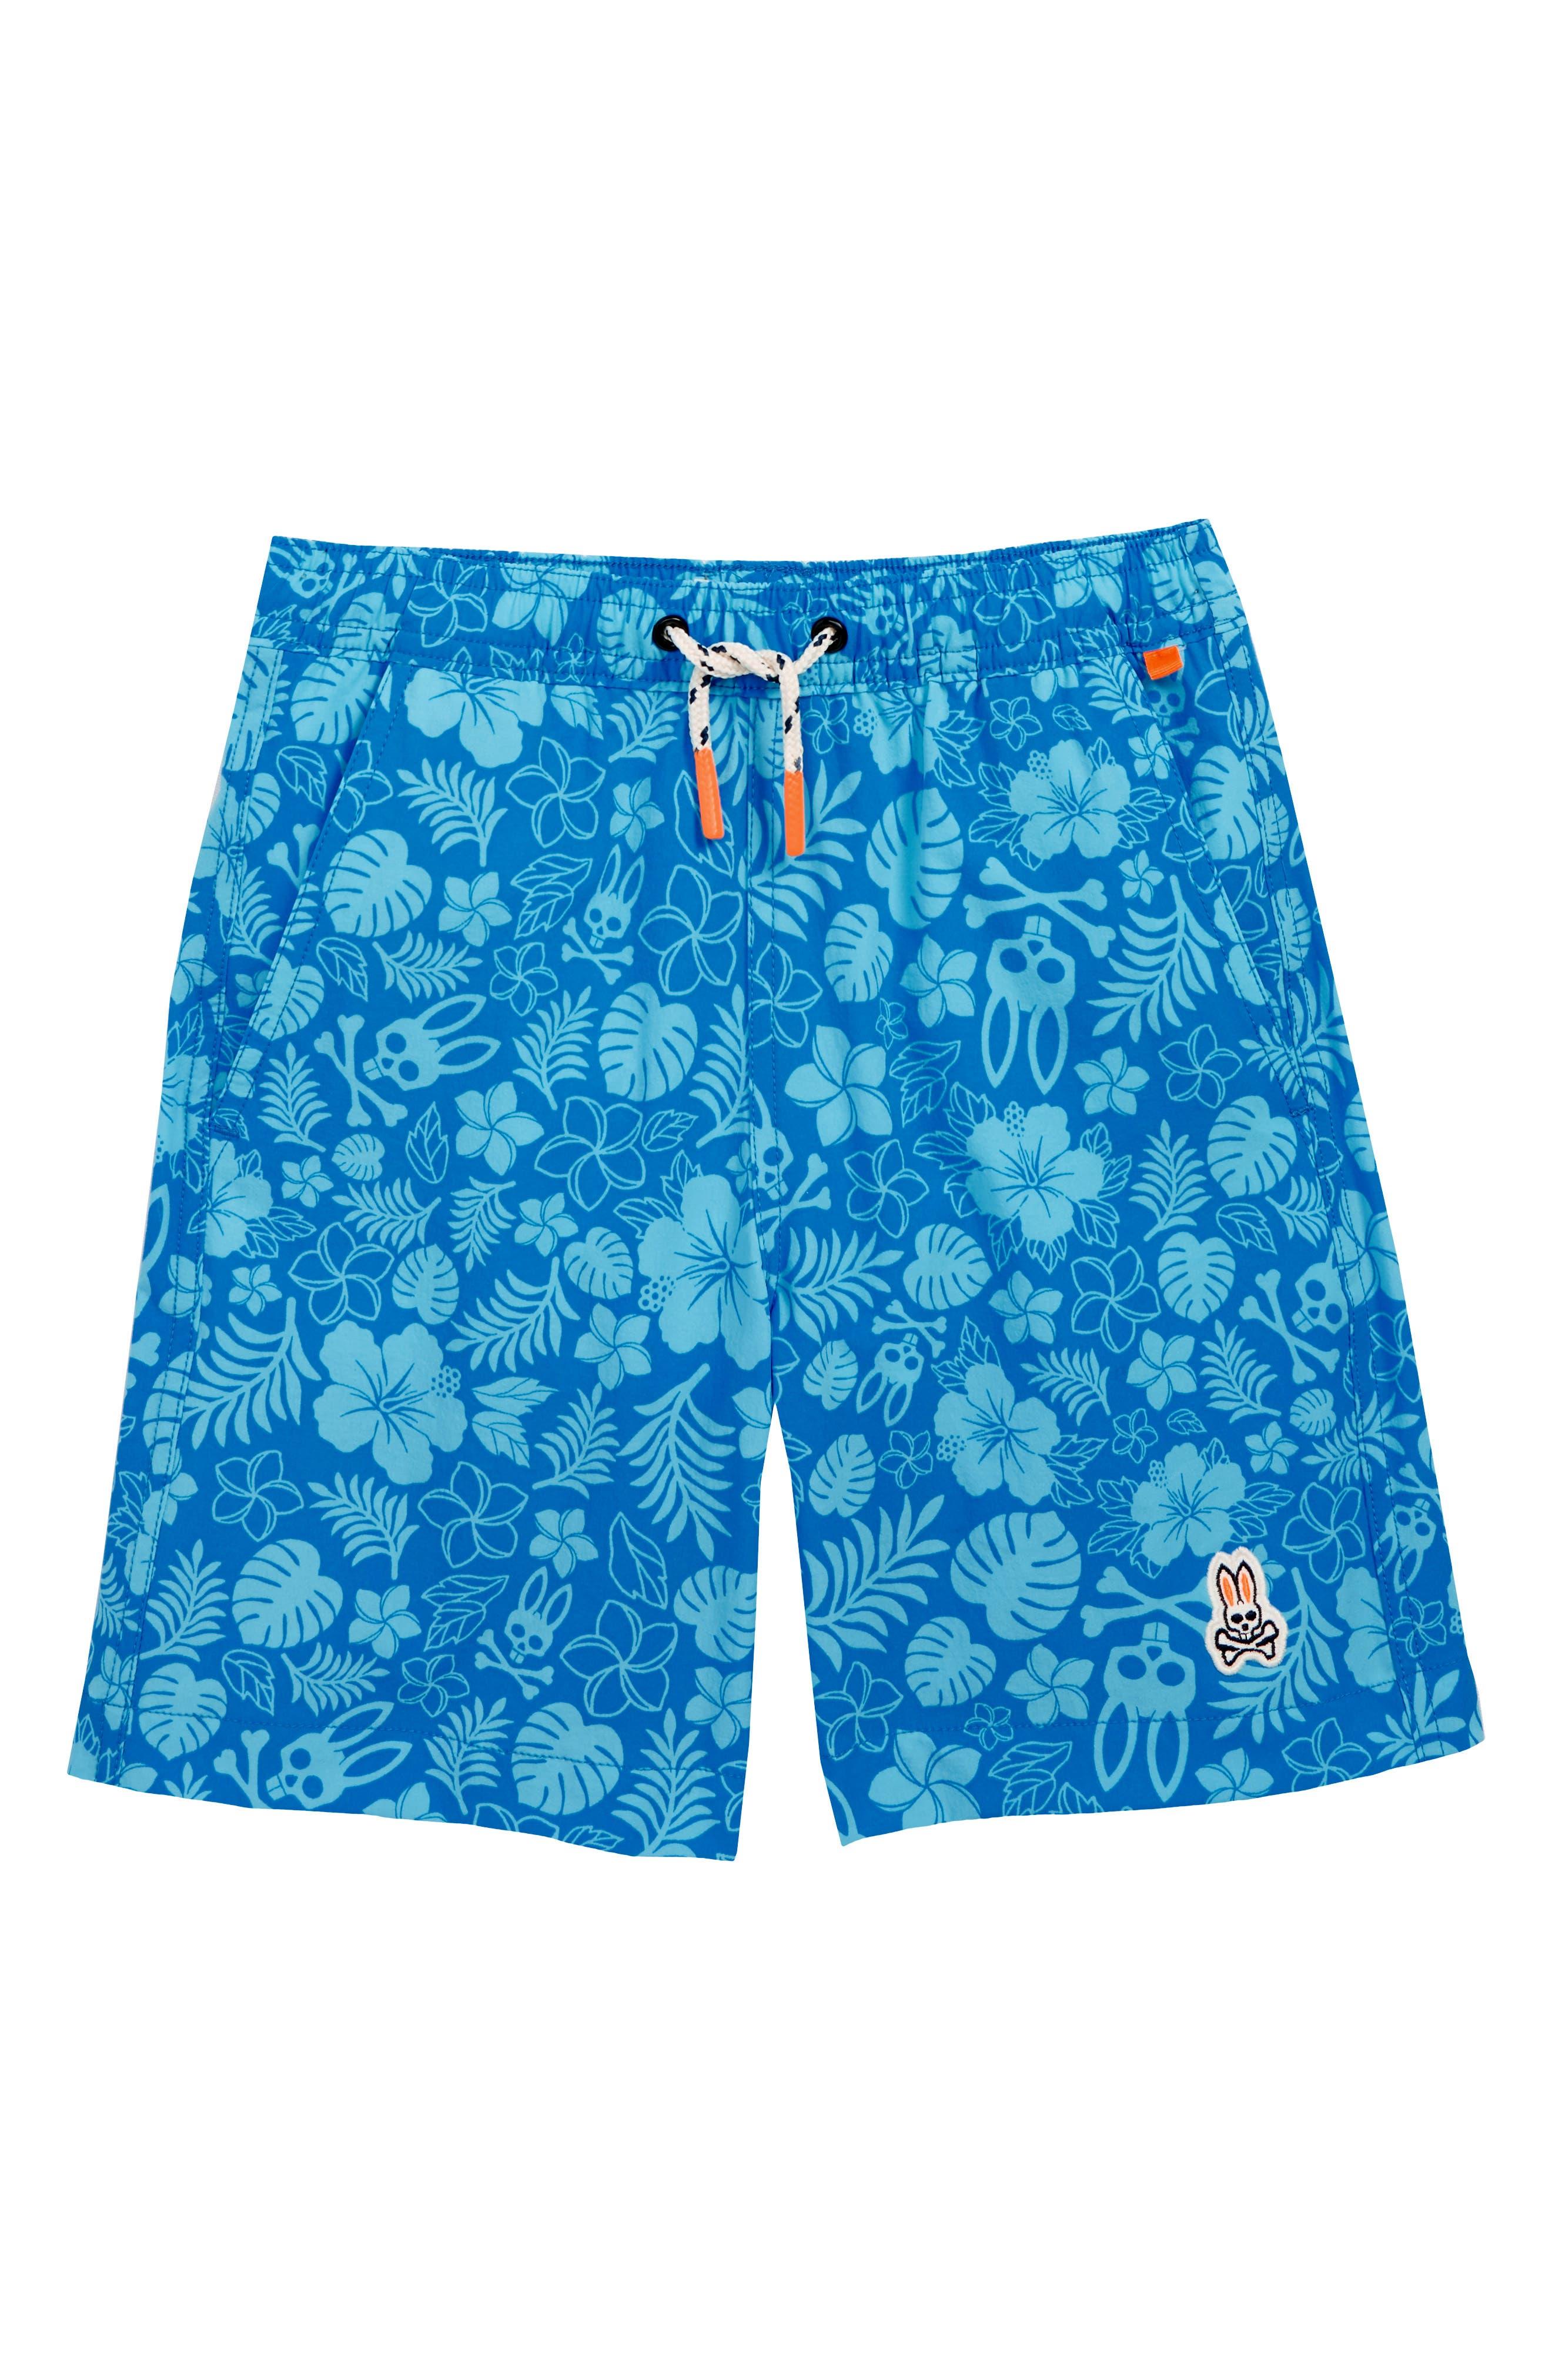 Swim Trunks,                         Main,                         color, 434